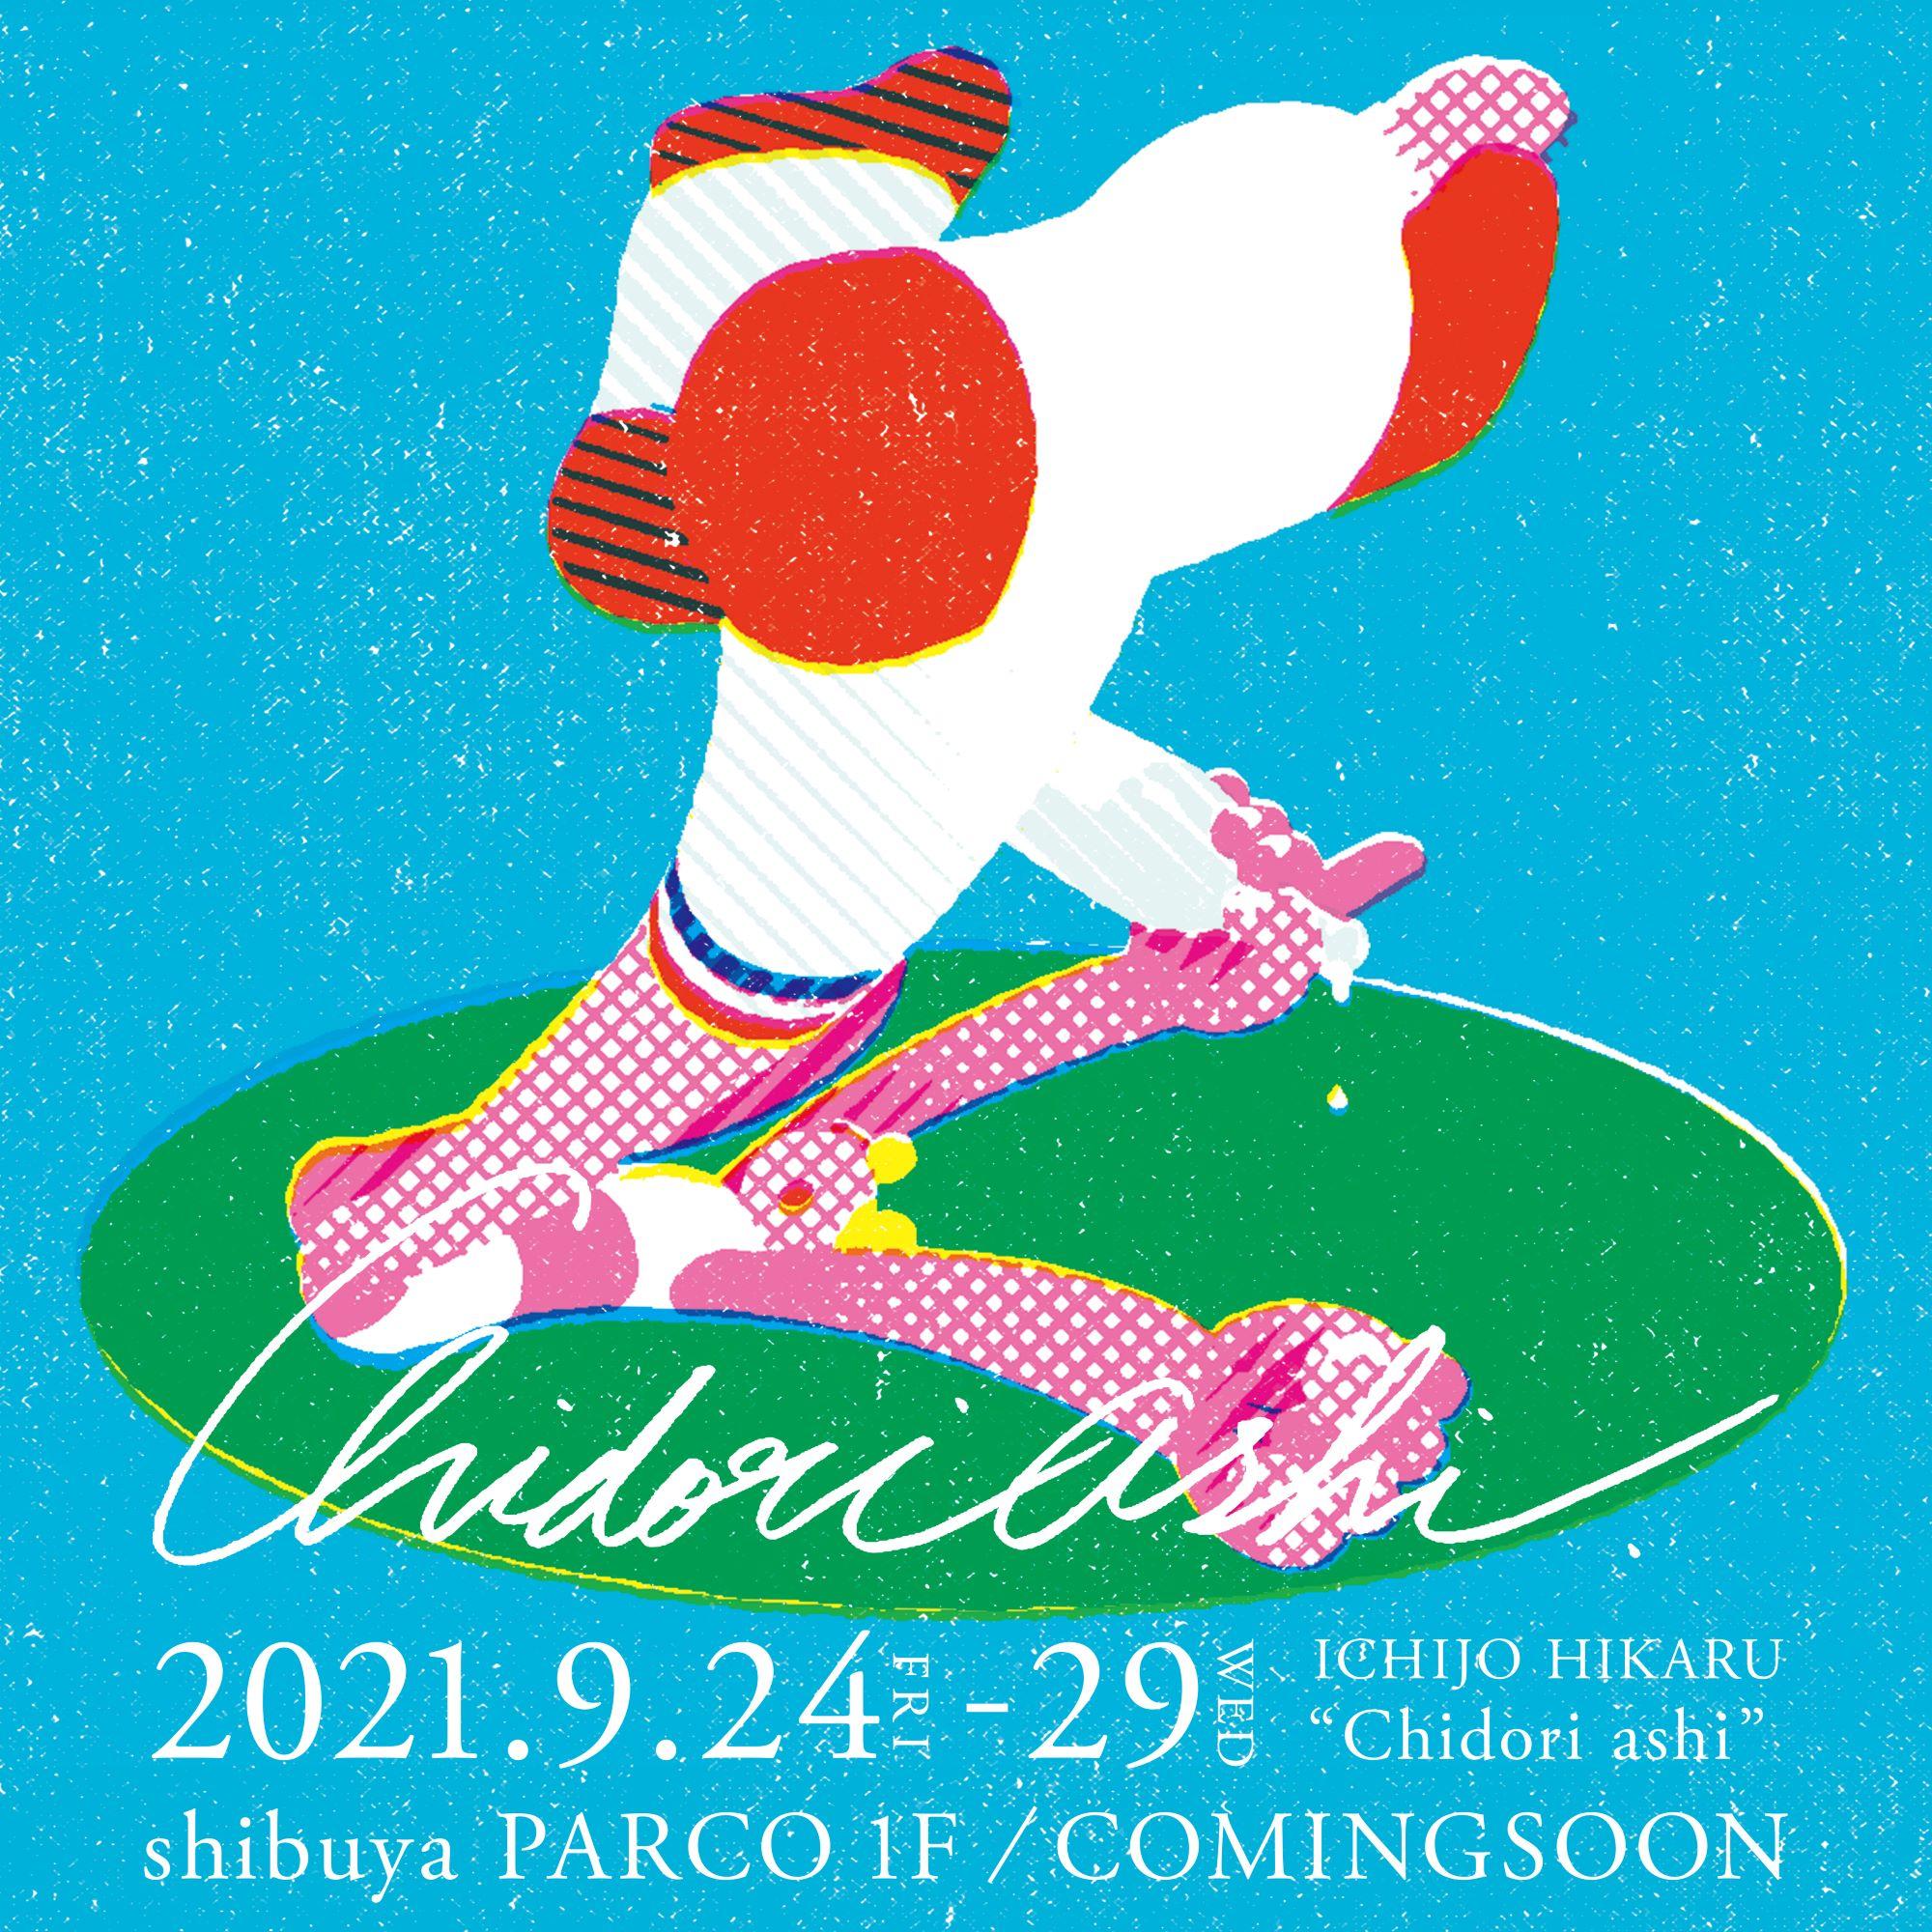 shibuya-parco-art-week-202120-2